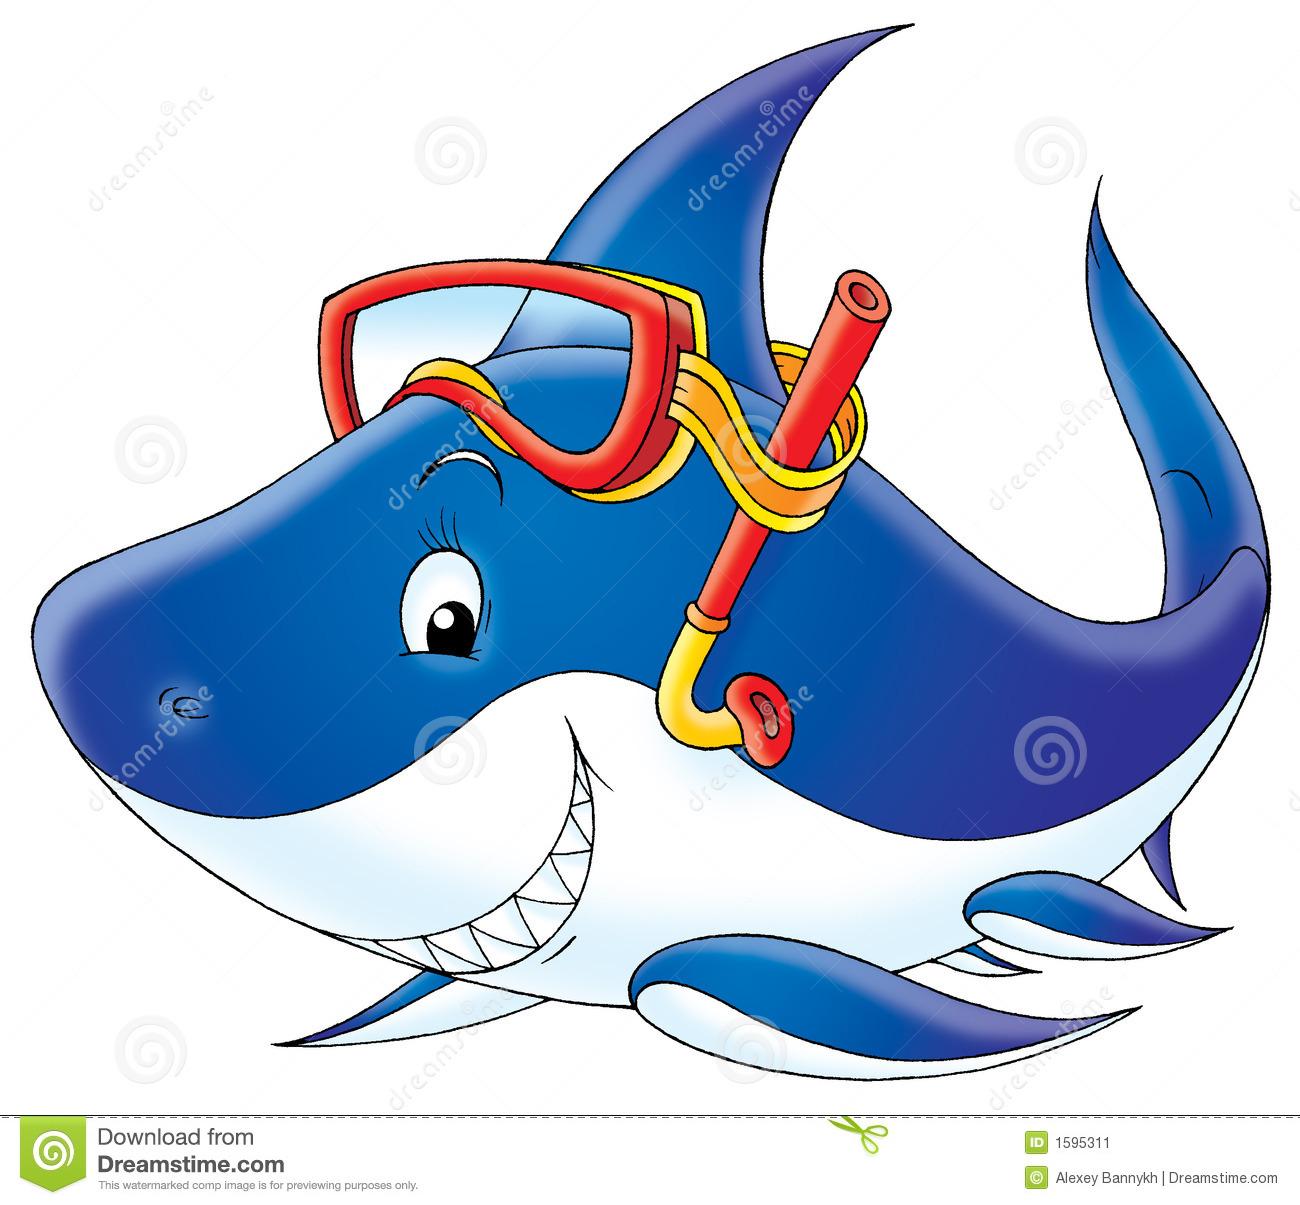 Cute Shark Clip Art | Clipart Panda - Free Clipart Images